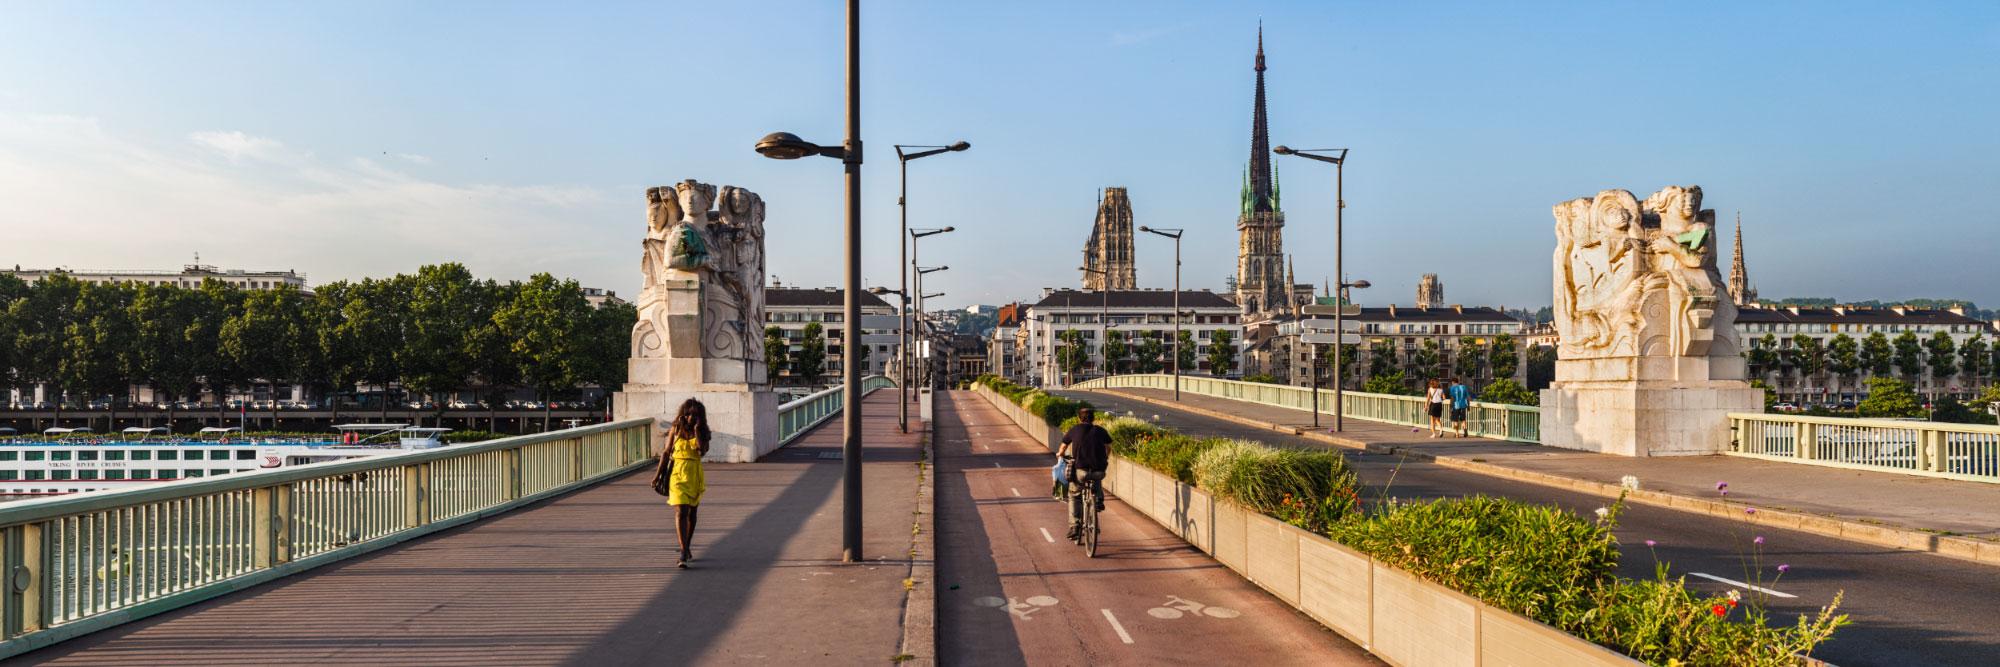 Pont Boieldieu, Rouen